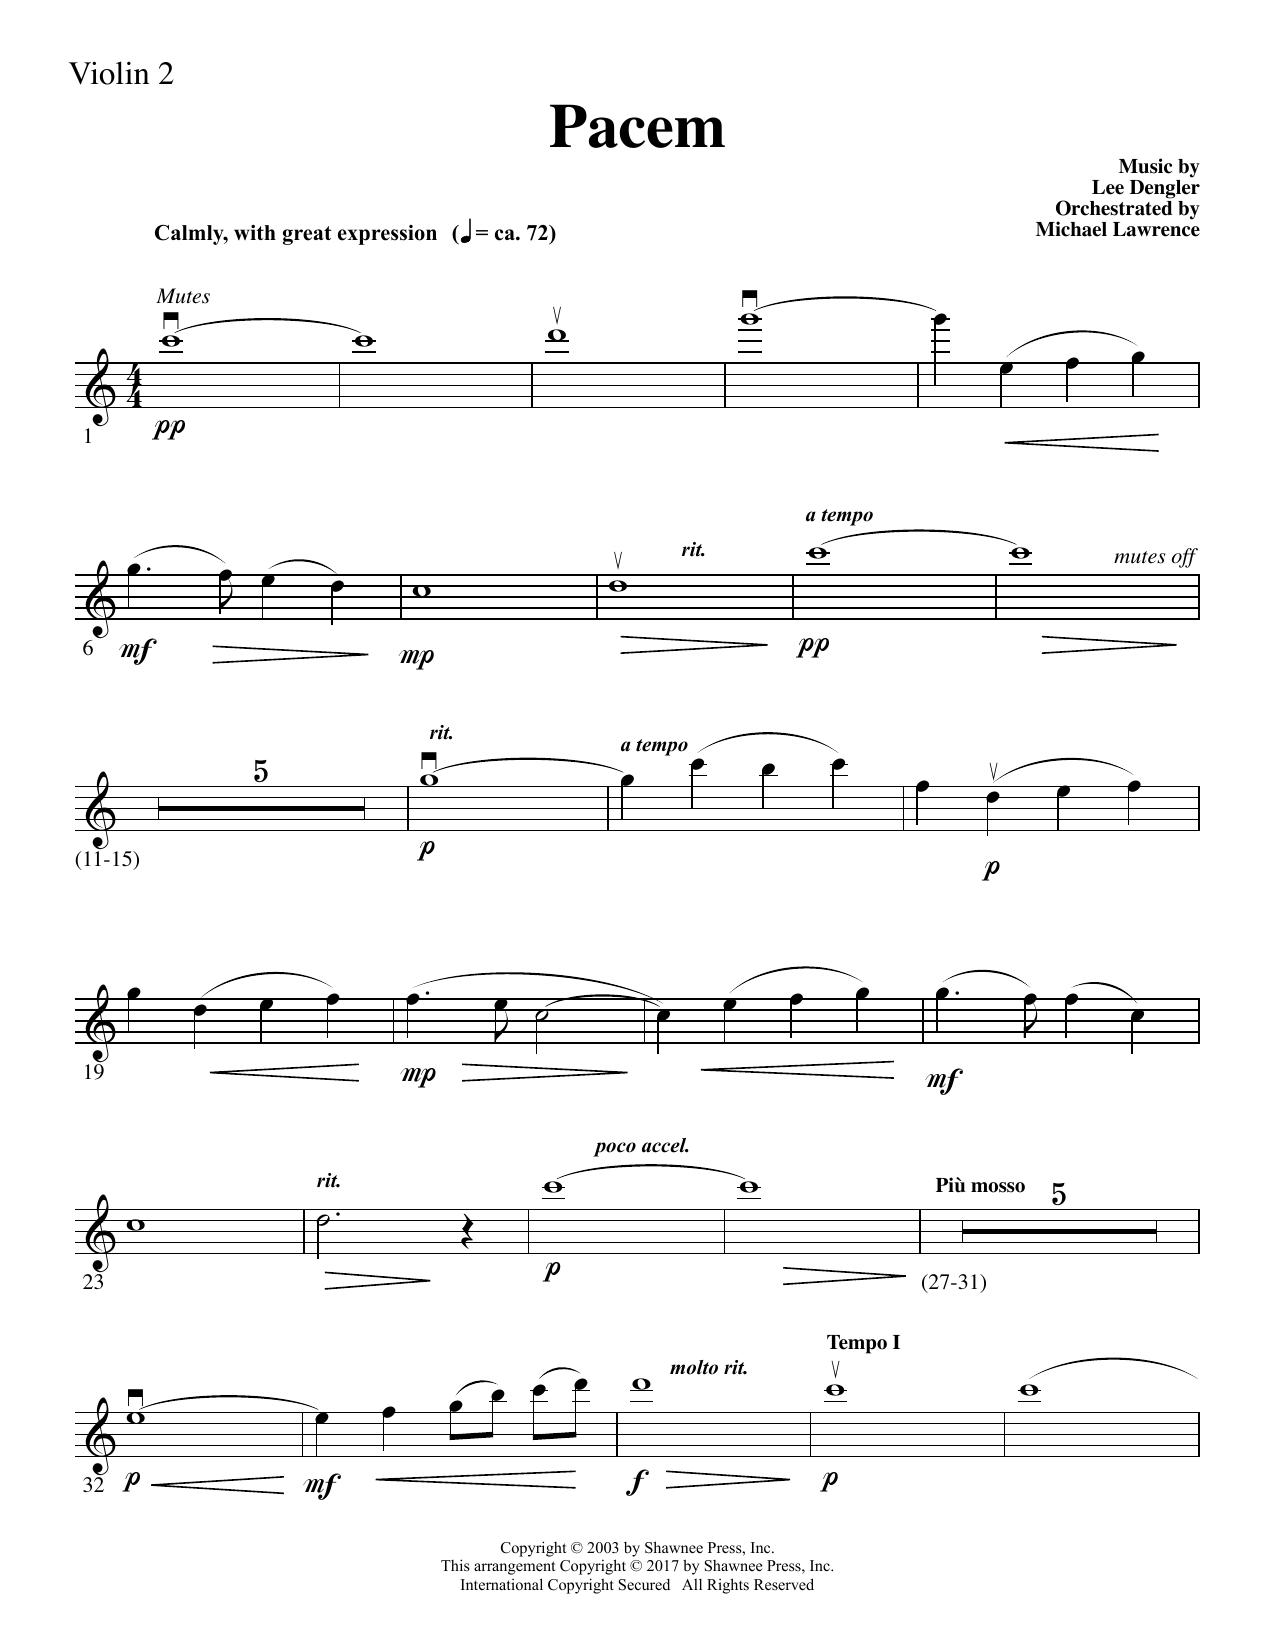 Pacem - Violin 2